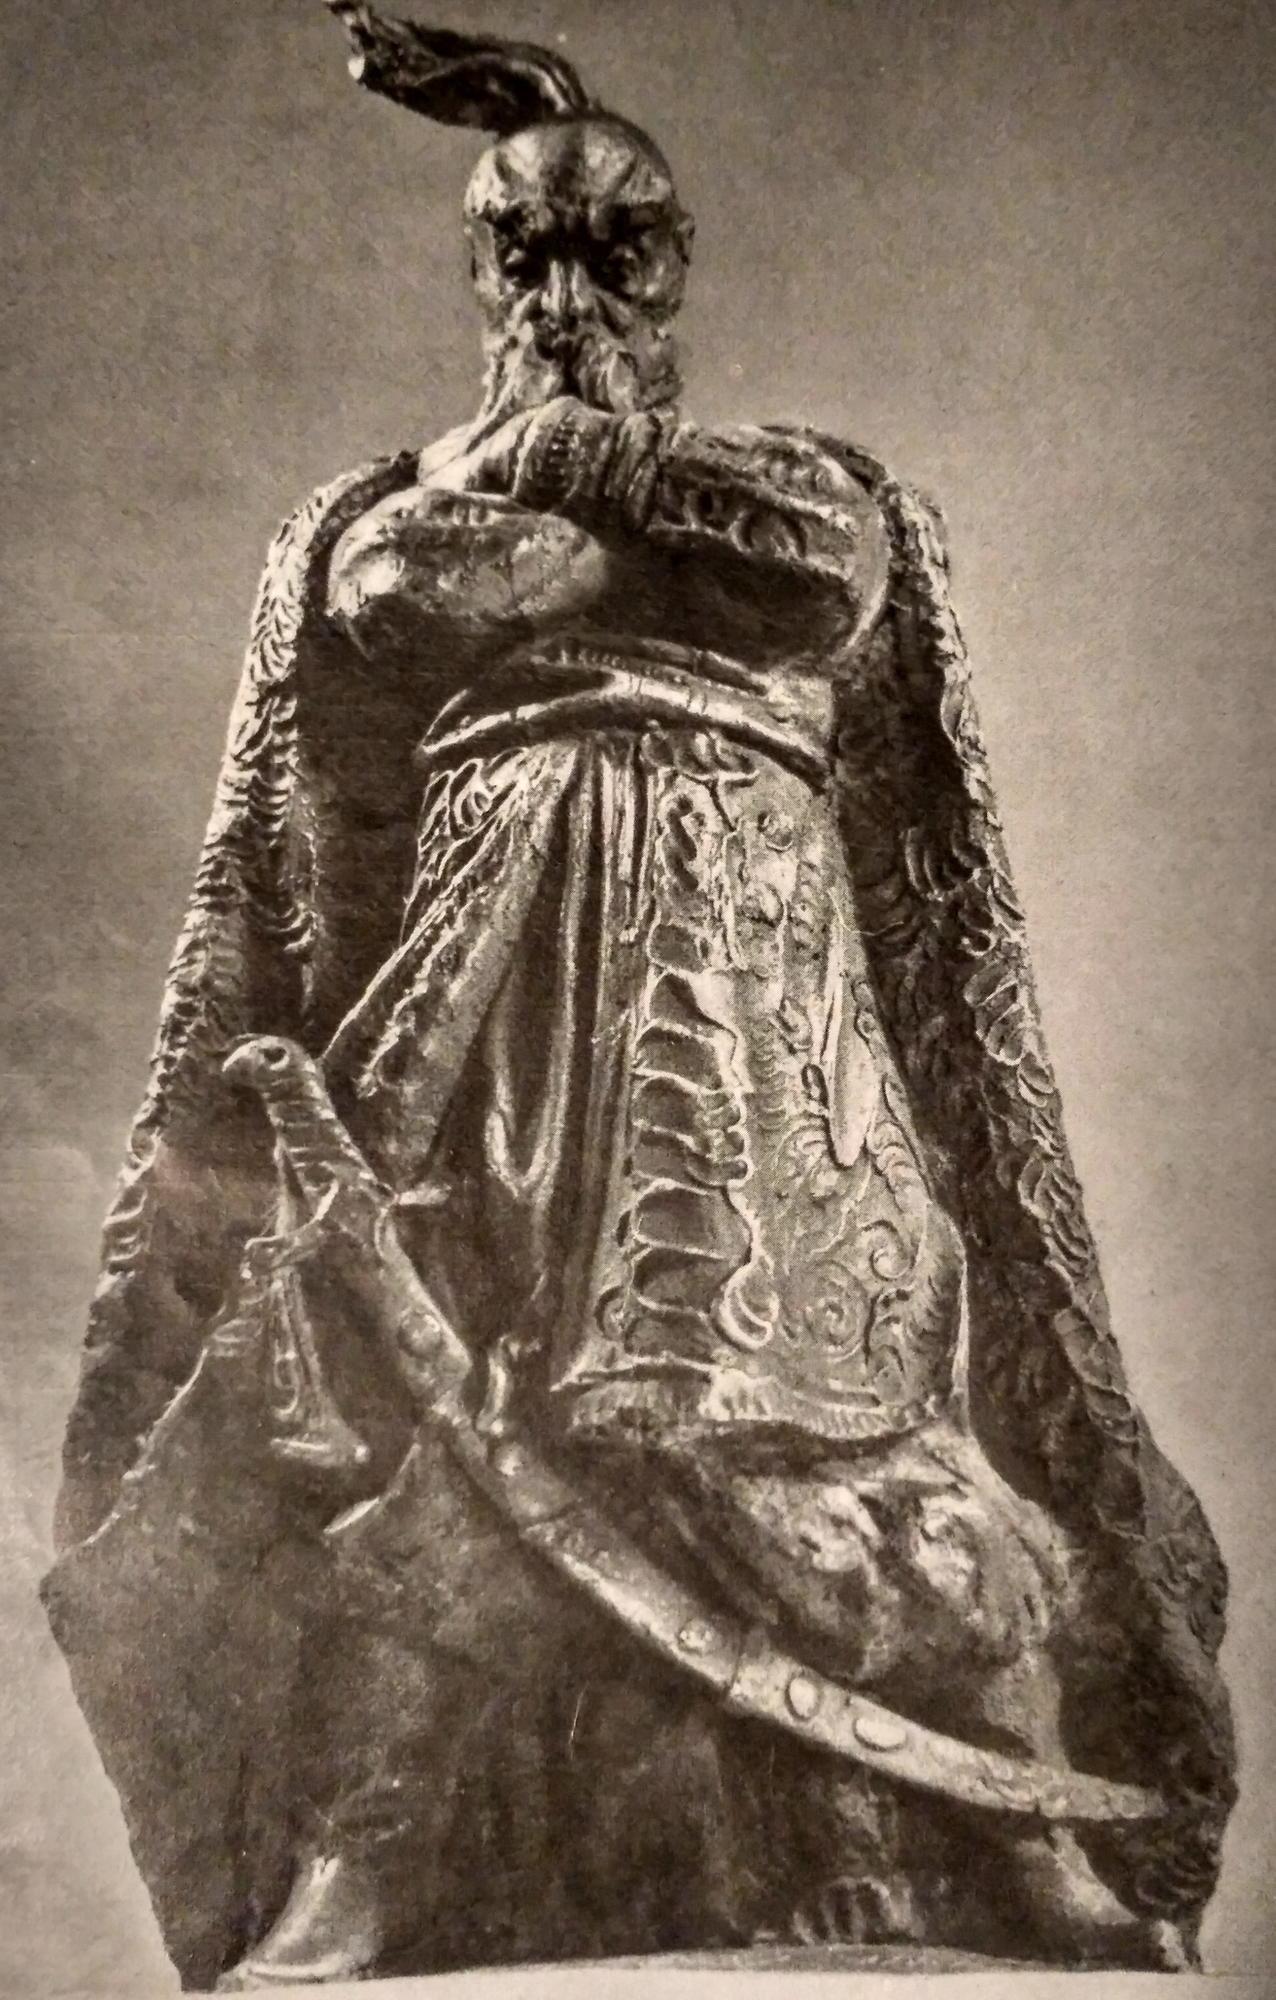 скульптура Миколи Мухіна